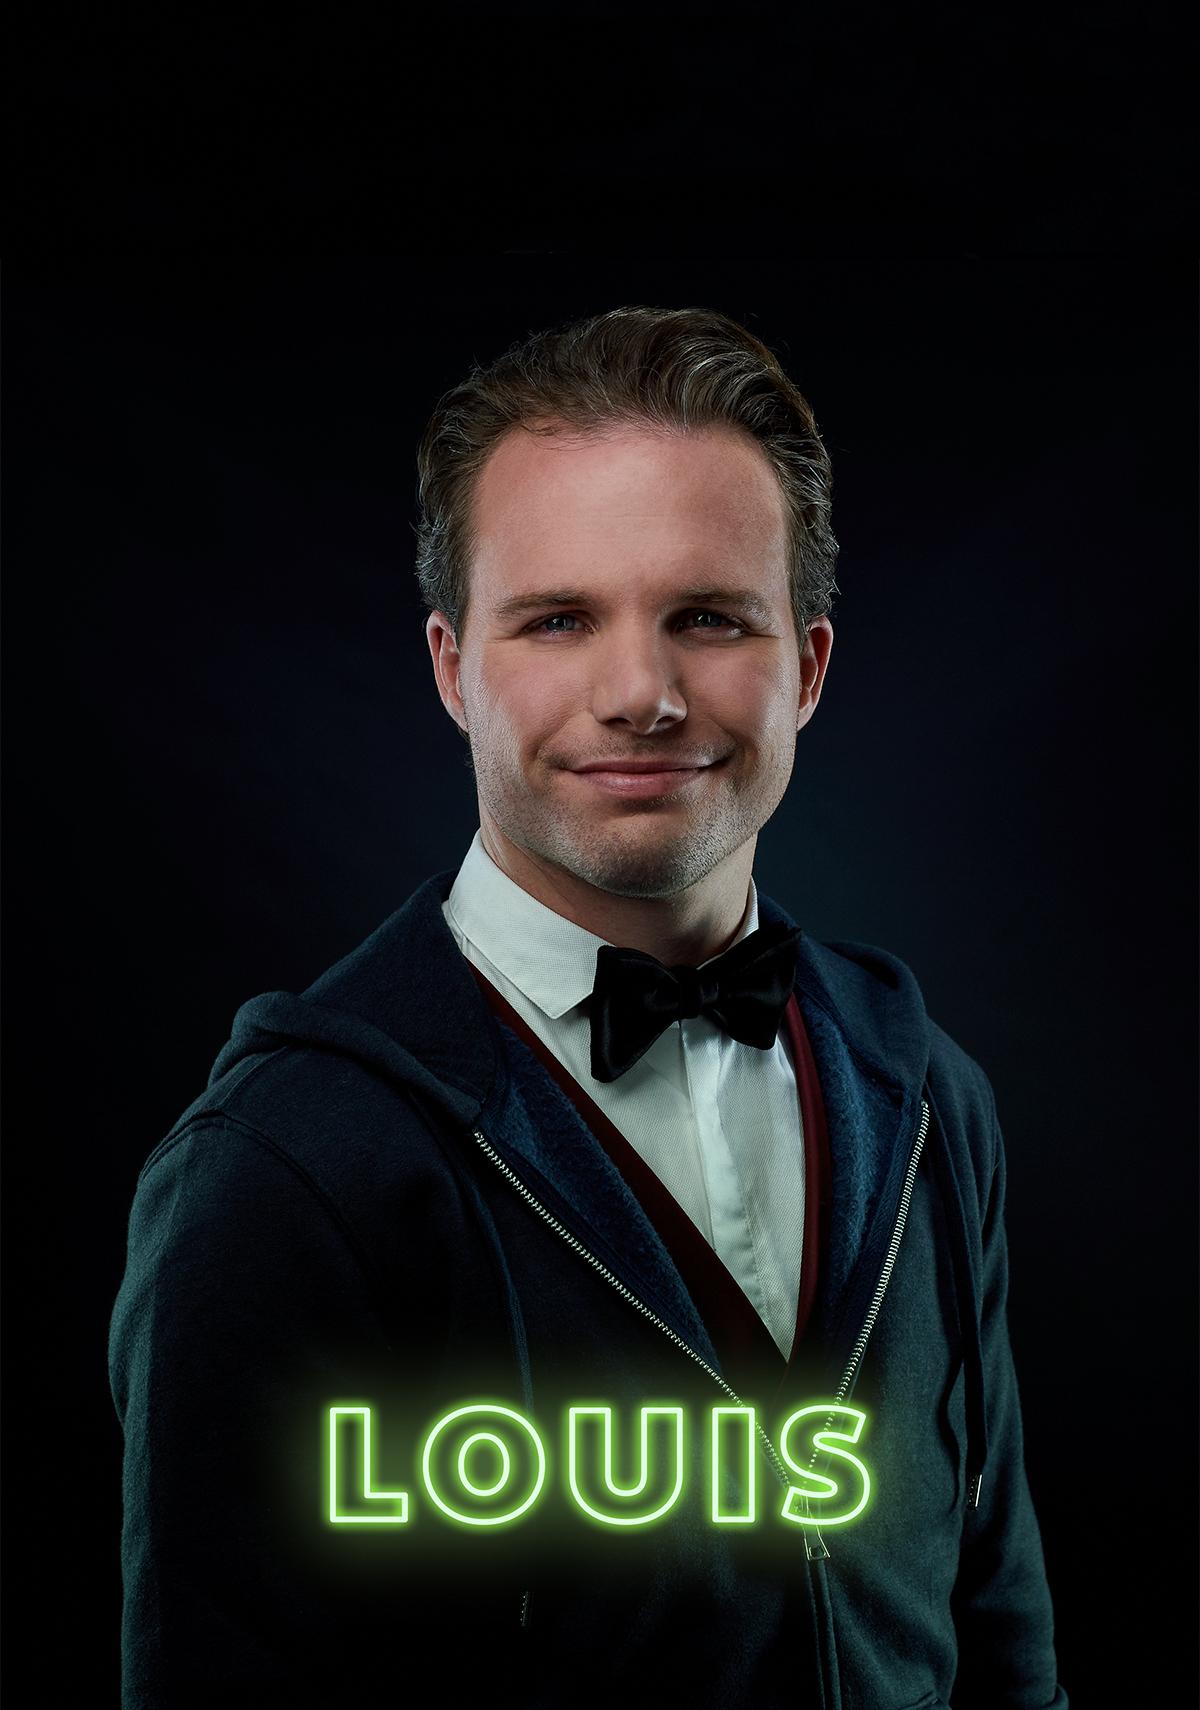 LOUIS_light.jpg